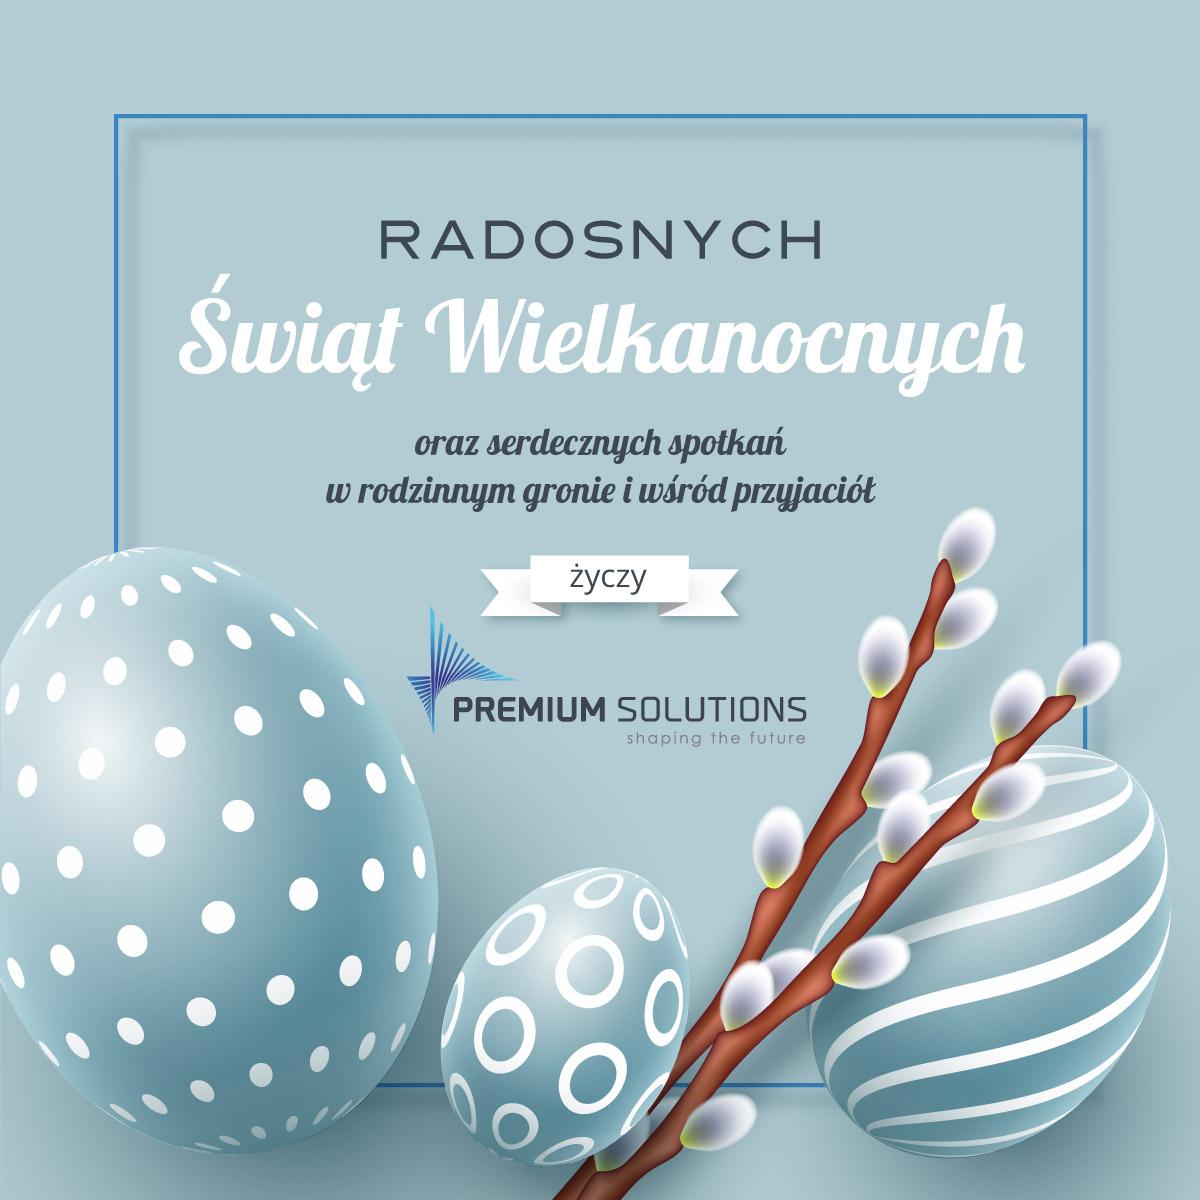 Kartka Świąteczna Premium Solutions Polska